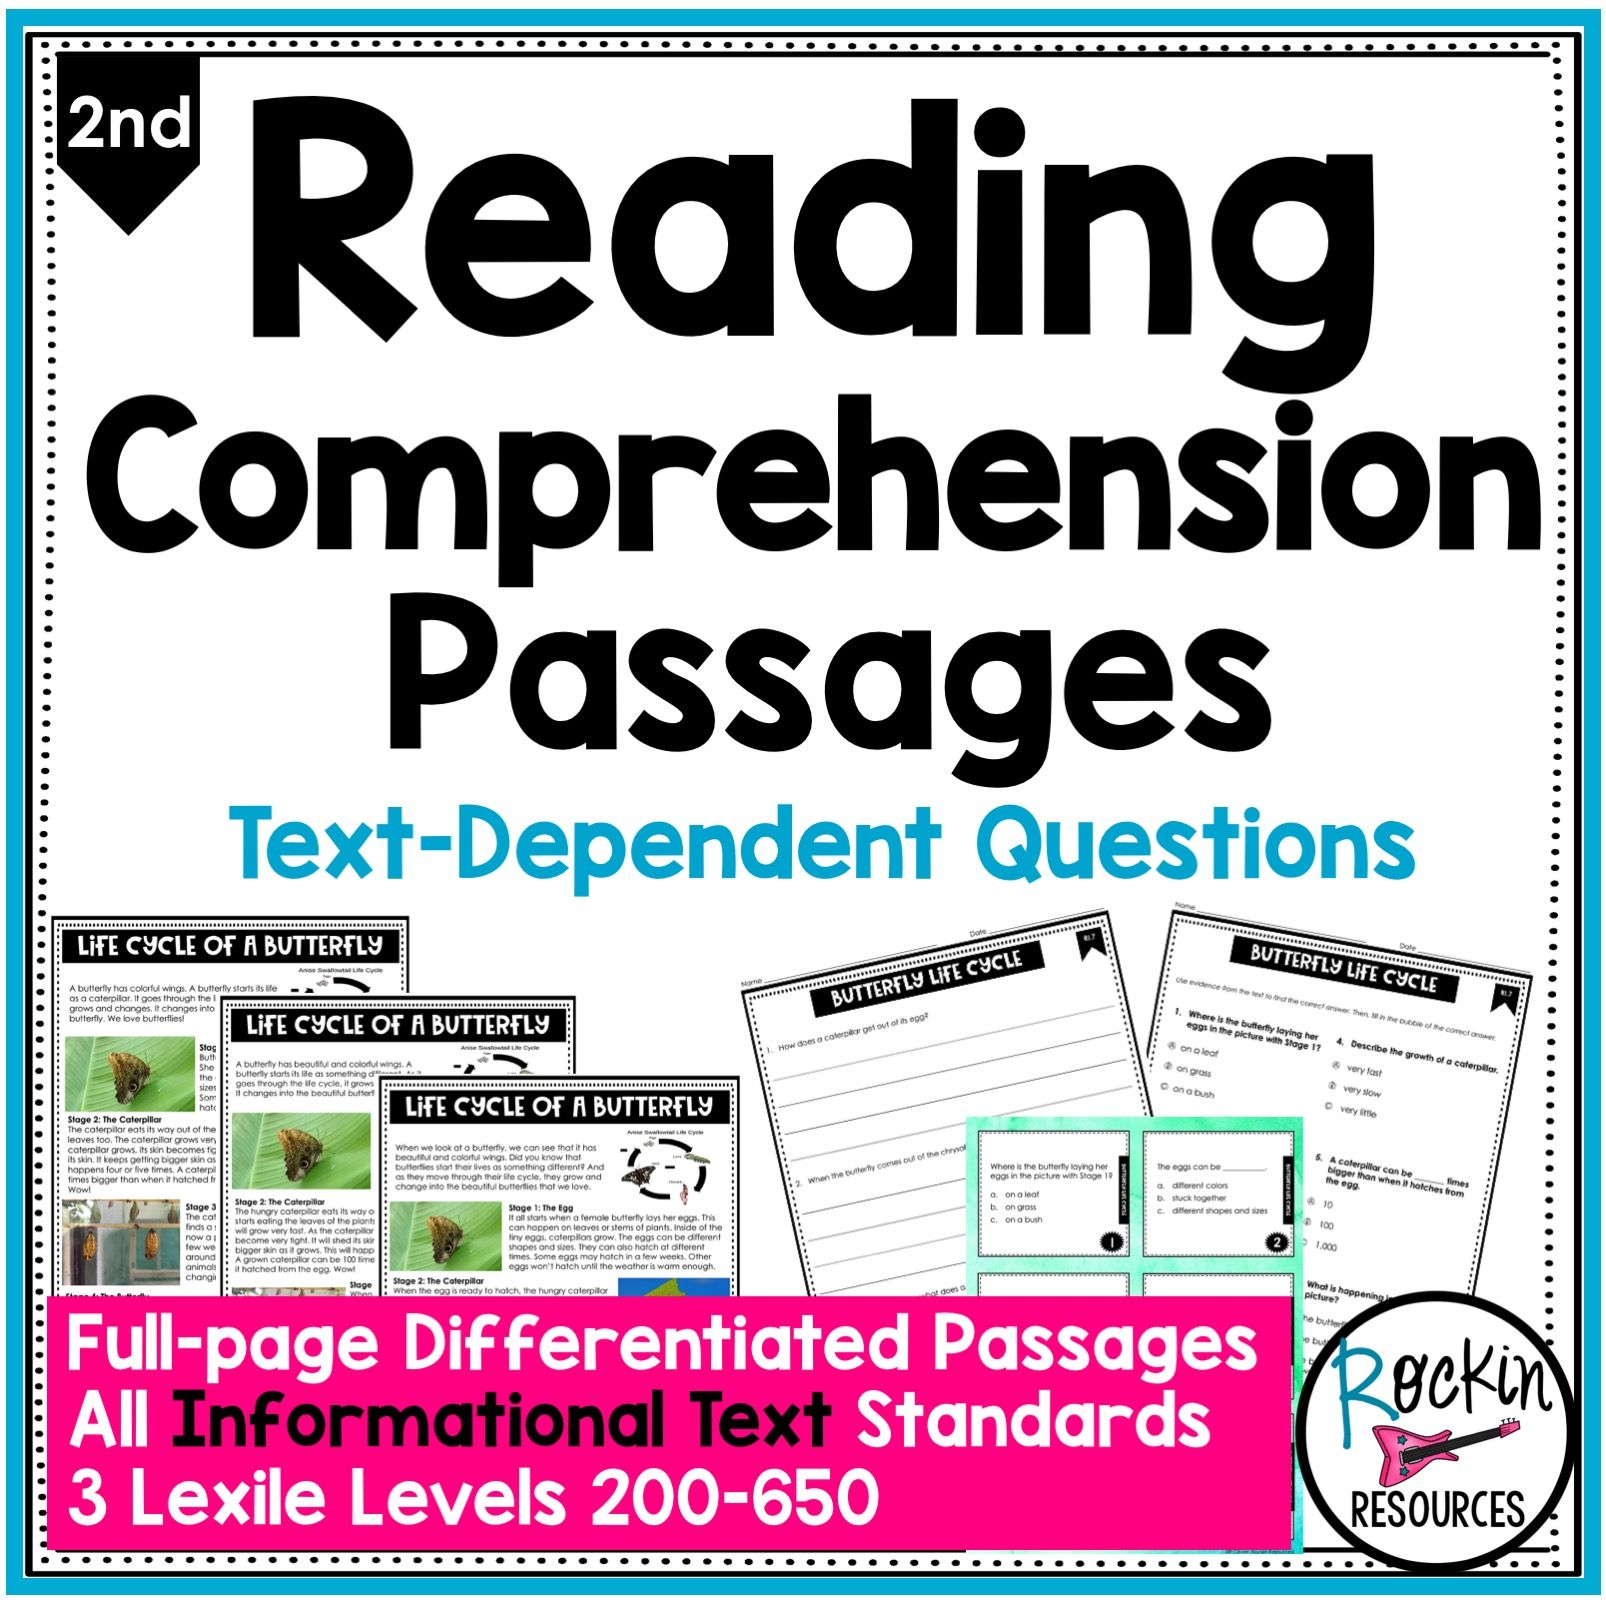 2nd Grade Informational Reading Comprehension Passages Rockin Resources Reading Comprehension Passages Comprehension Passage Informational Reading [ 1606 x 1606 Pixel ]